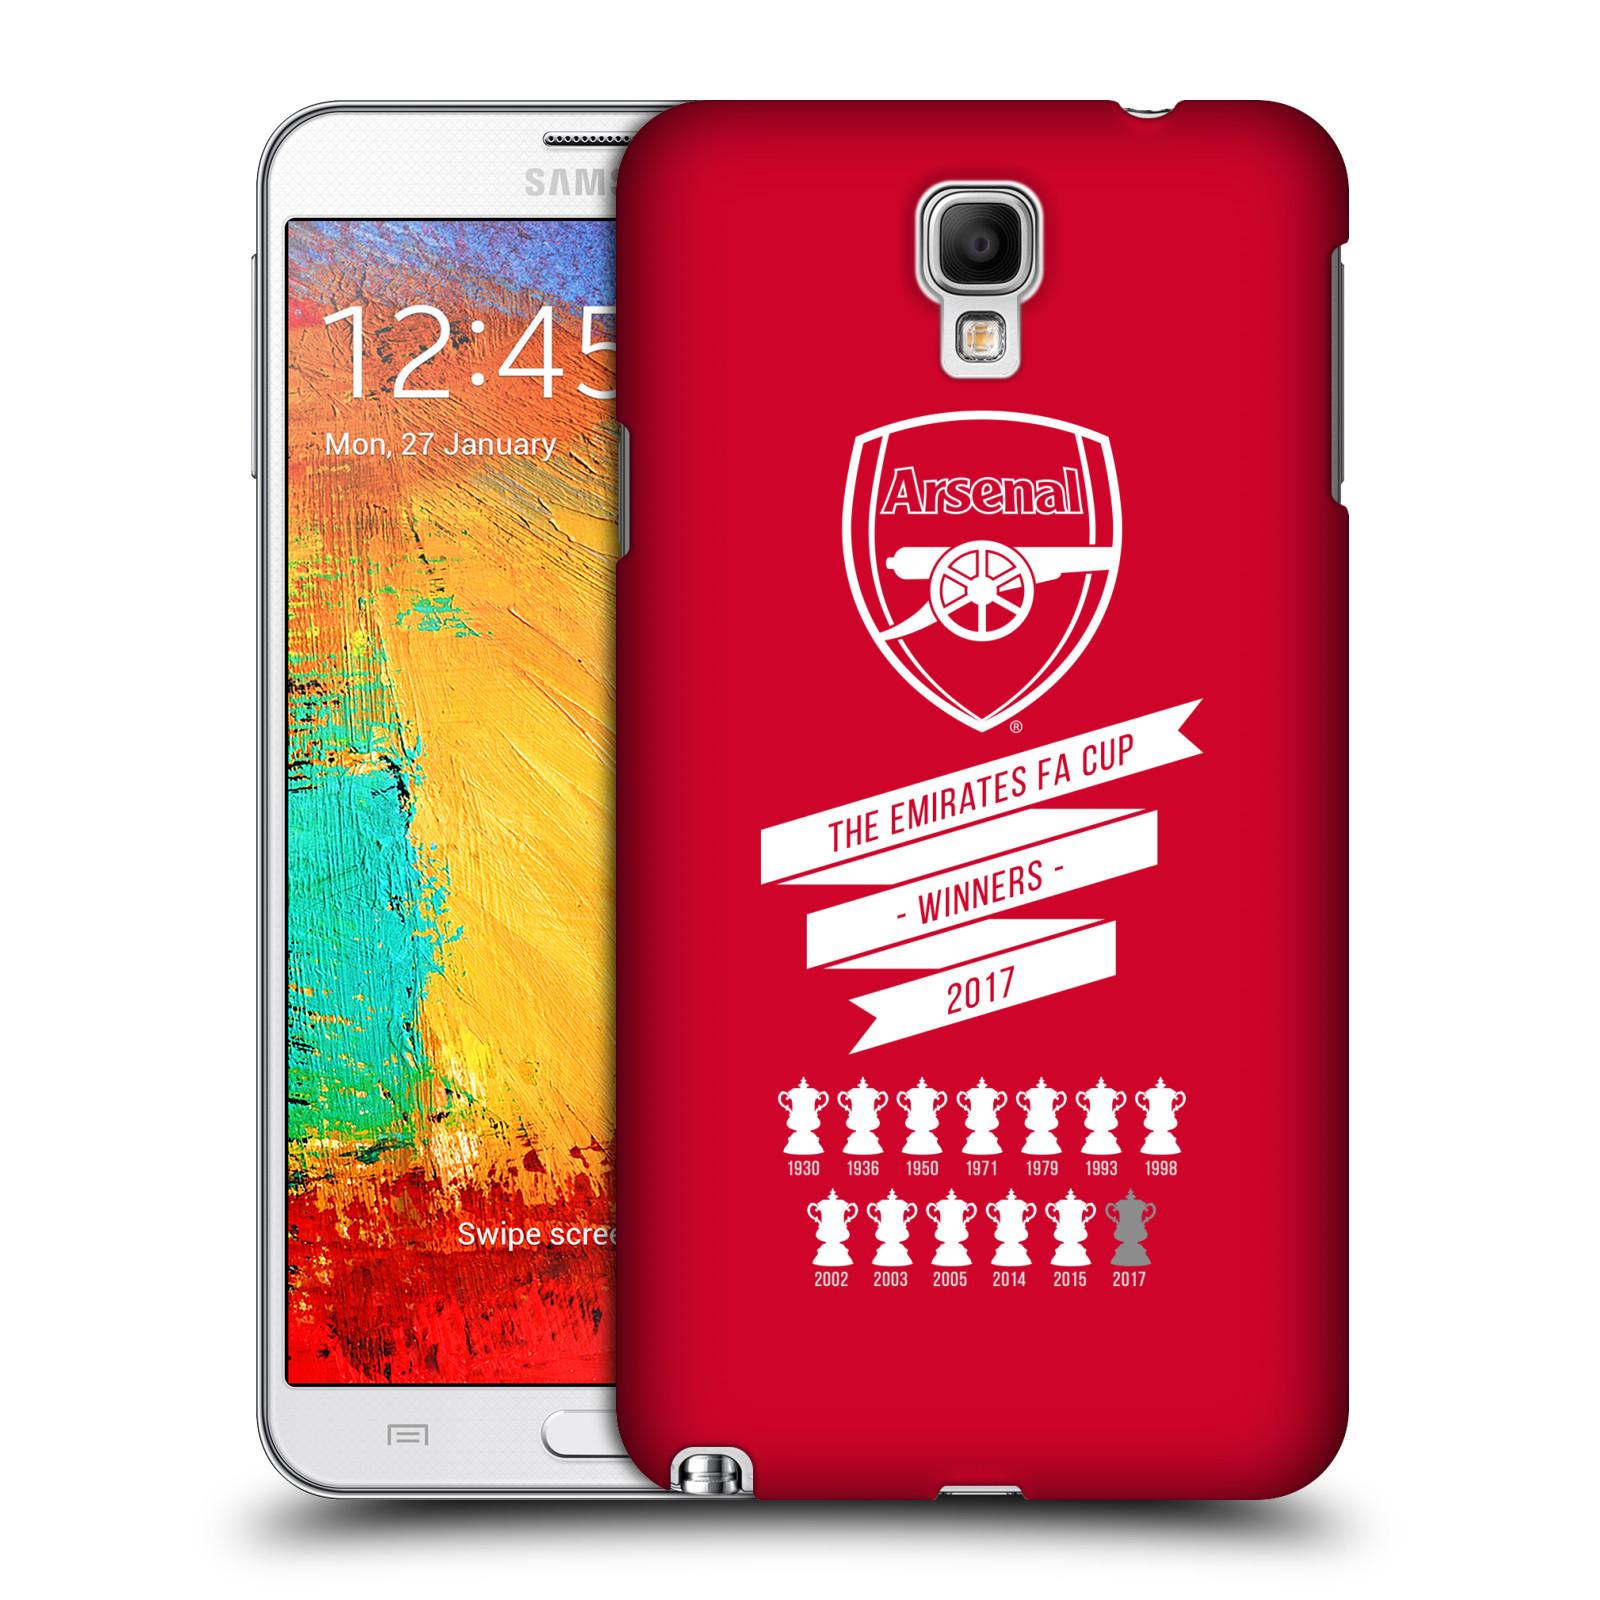 Plastové pouzdro na mobil Samsung Galaxy Note 3 Neo - Head Case - Arsenal FC - 13 Wins